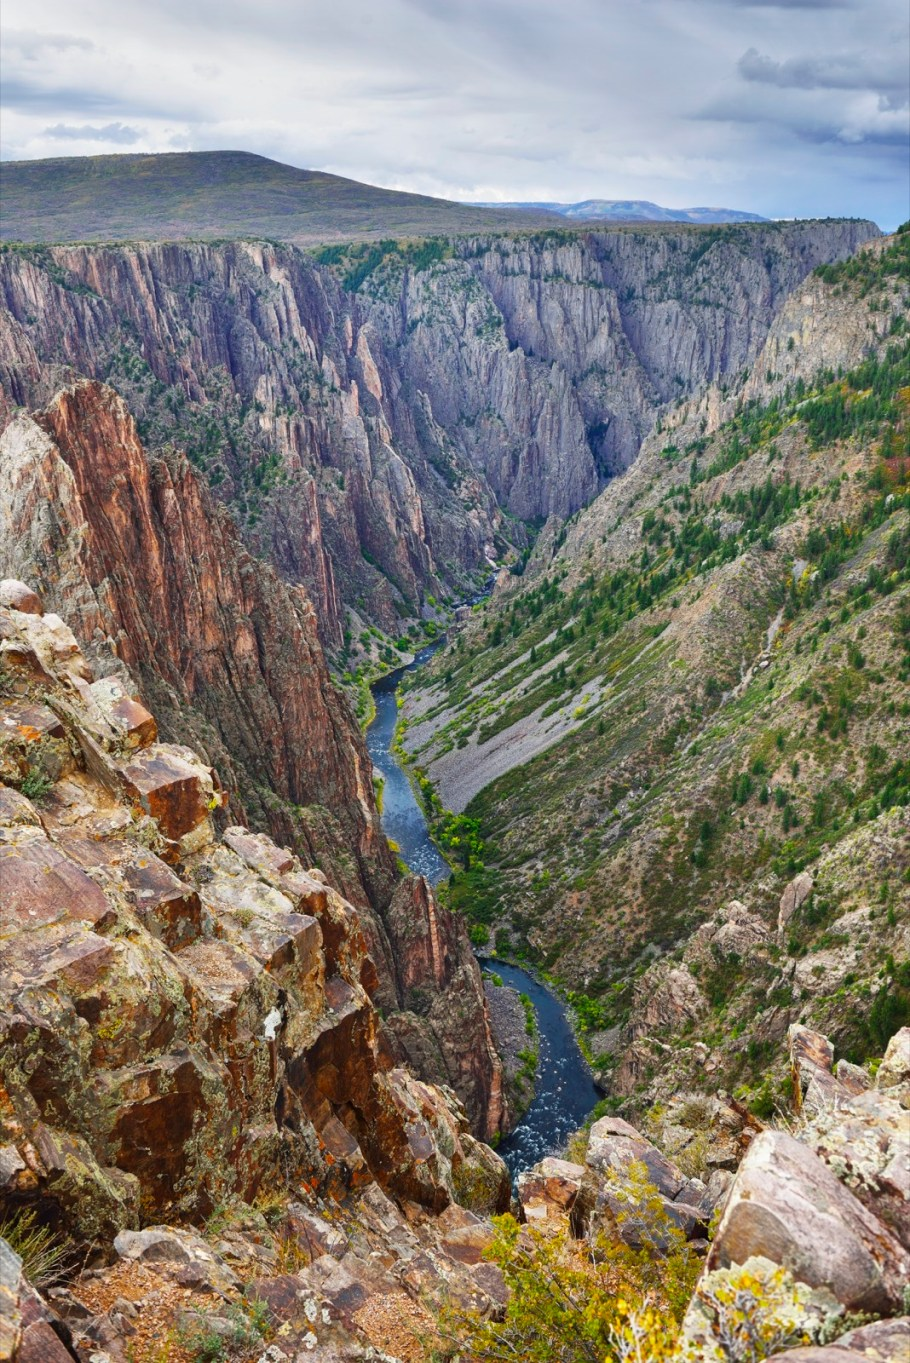 black-canyon-of-the-gunnison-national-park.jpg?mtime=20200115141826#asset:107687